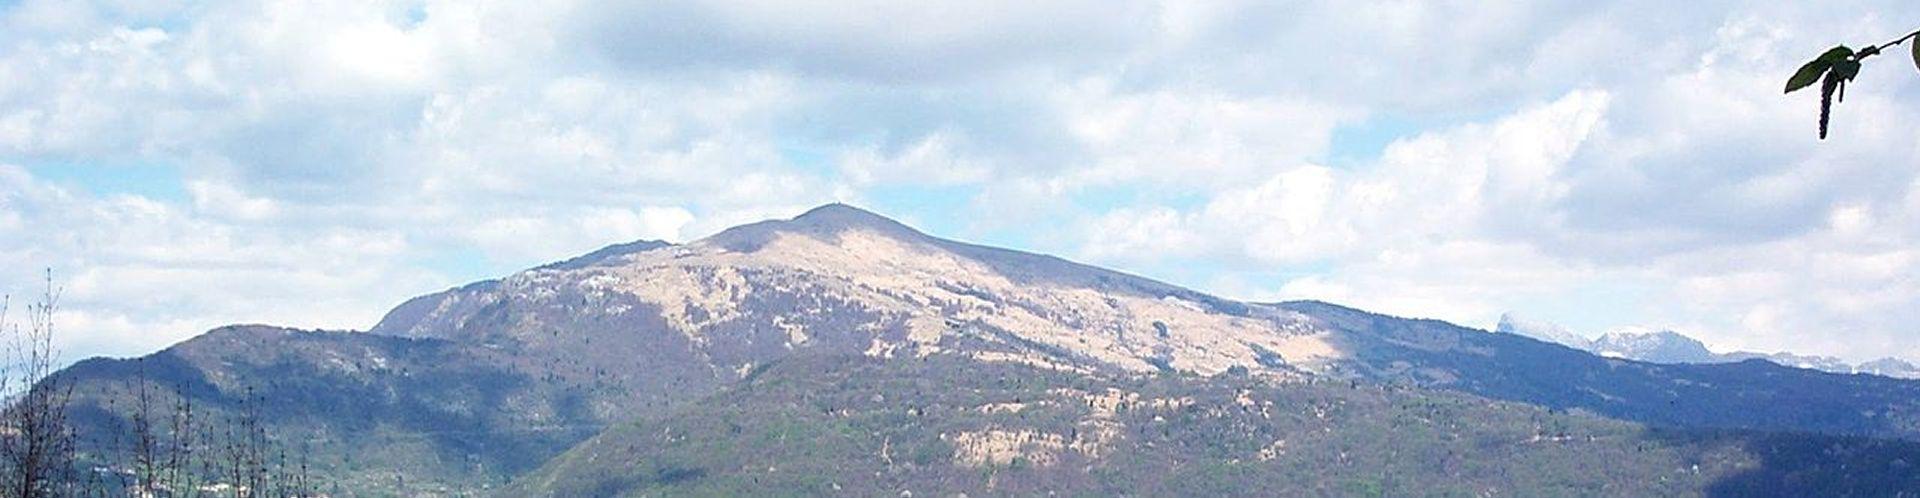 Il Monte Matajur